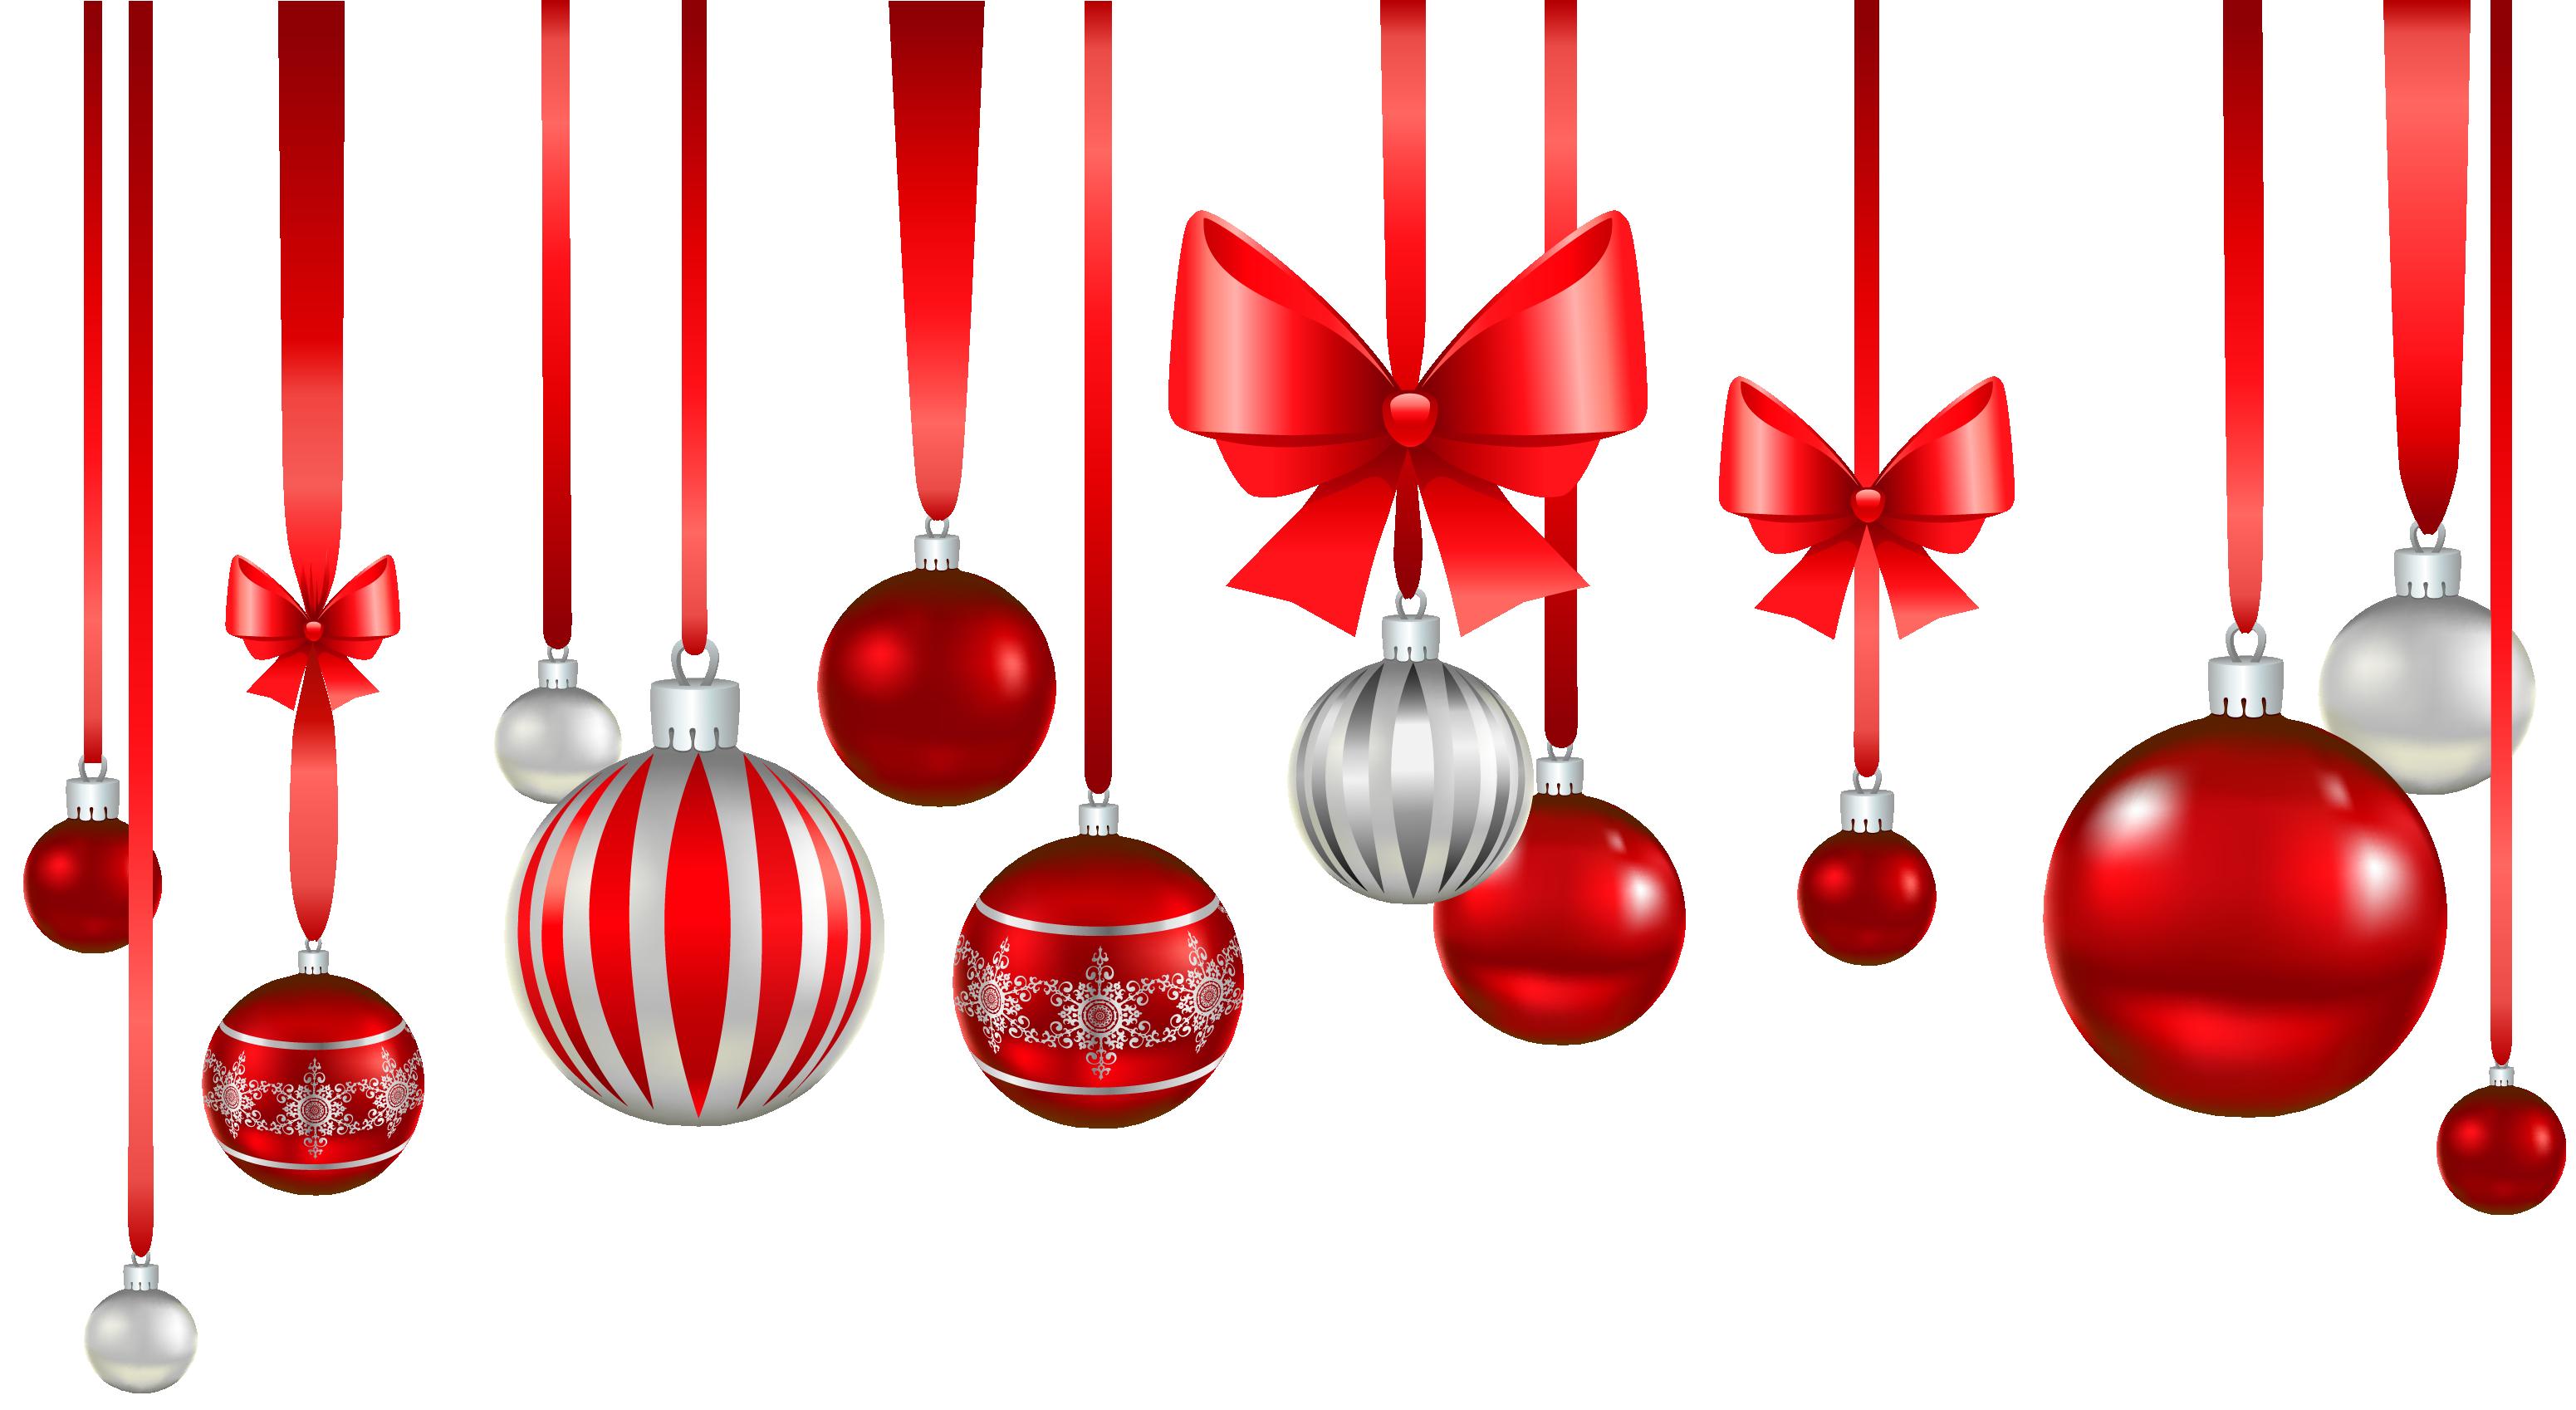 Hanging star oraments clipart clip transparent stock Christmas Ornament PNG Transparent Images   PNG All clip transparent stock